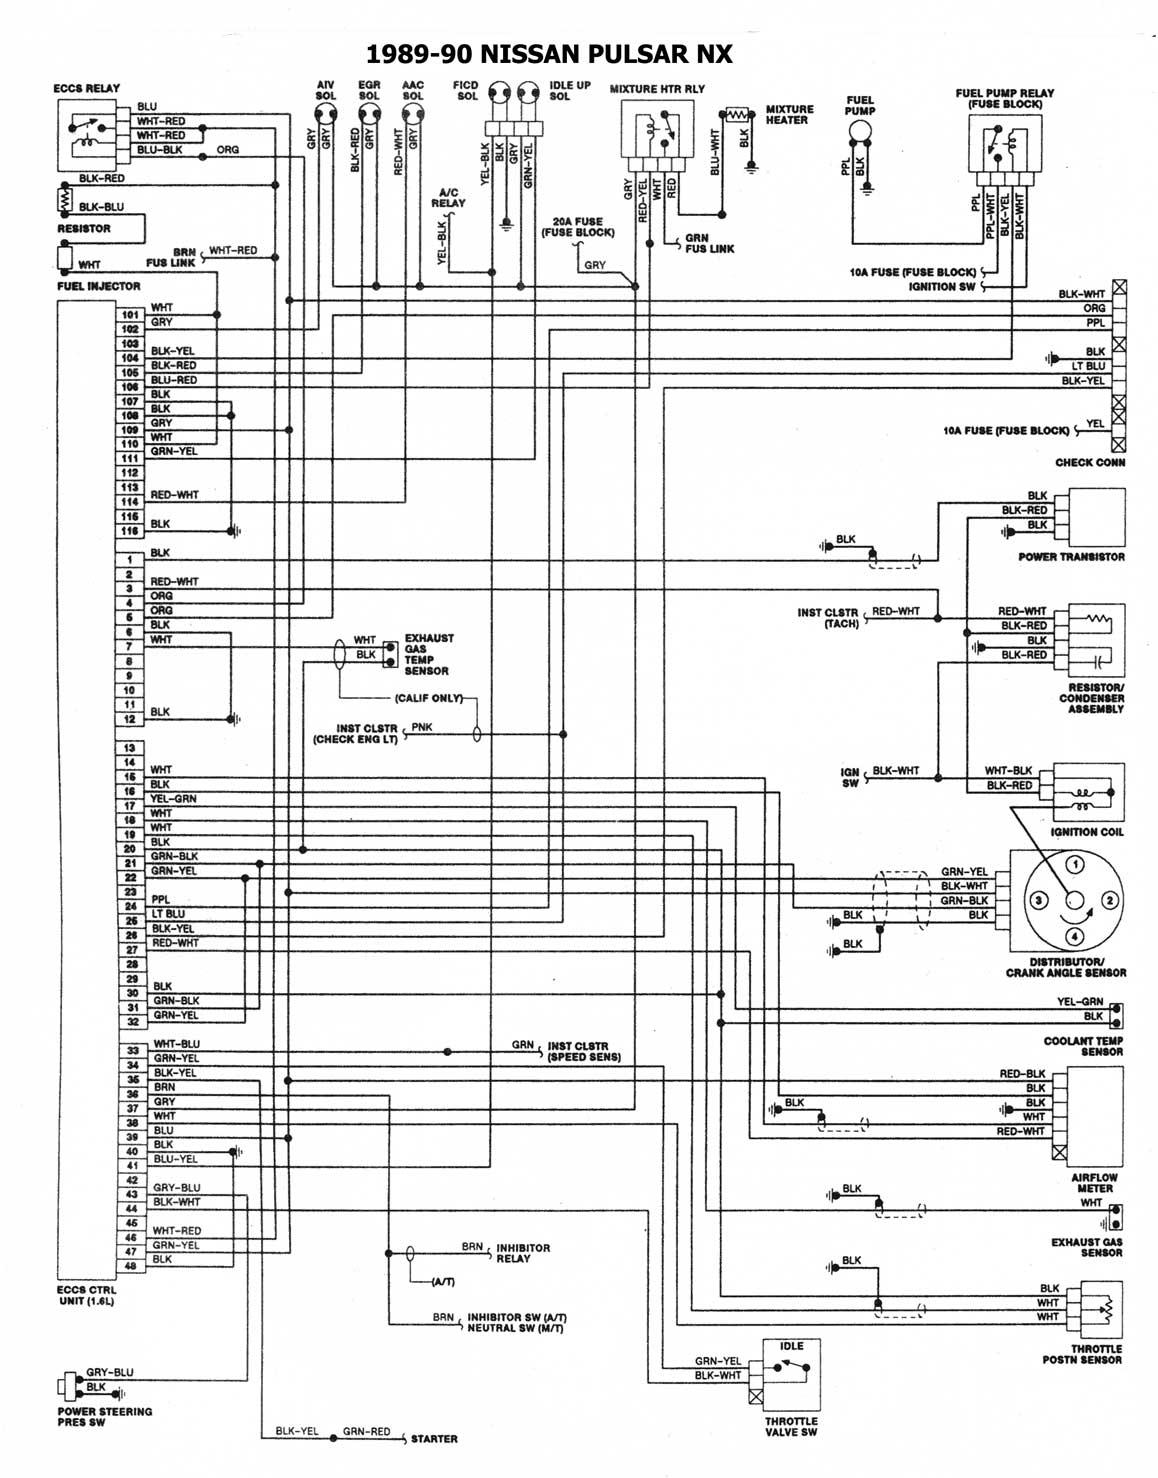 Nissan 1986 93 Diagramas Esquemas Ubicacion De Componentes 89 Maxima Fuse Box 1989 90 Esquema Electrico